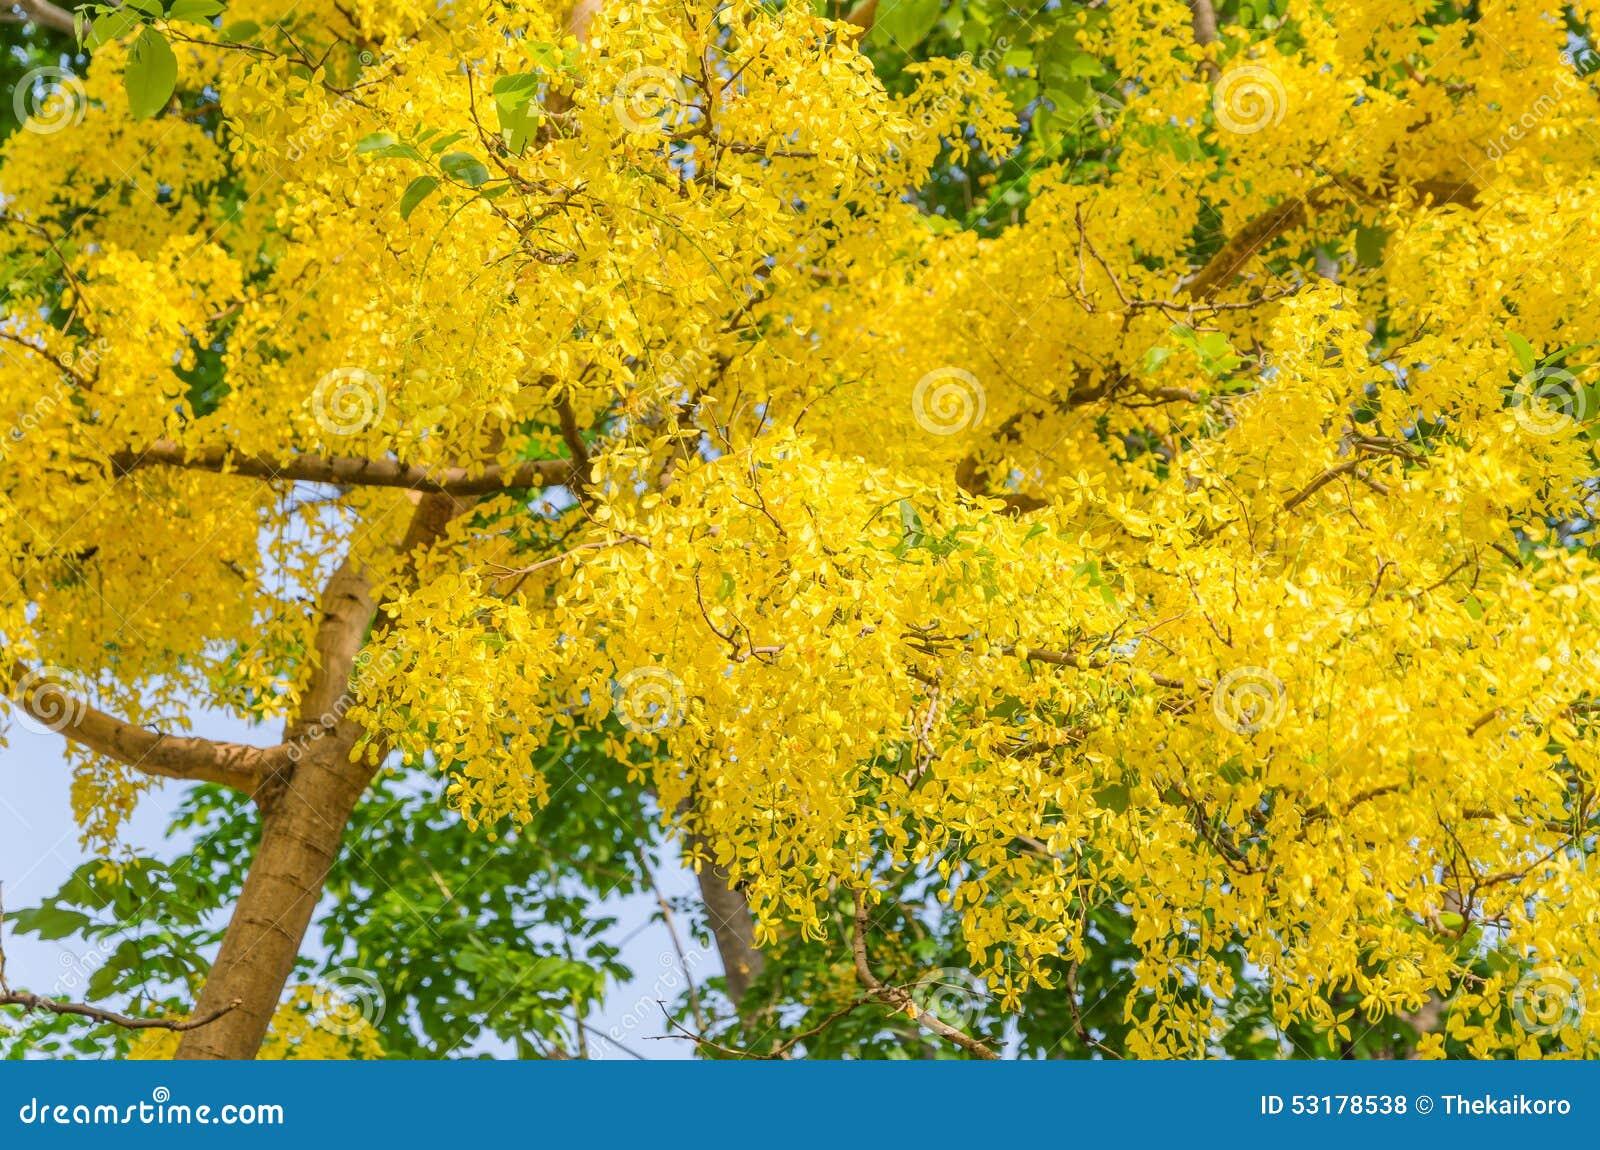 Golden Shower Tree Beautiful Yellow Flower Stock Photo Image Of